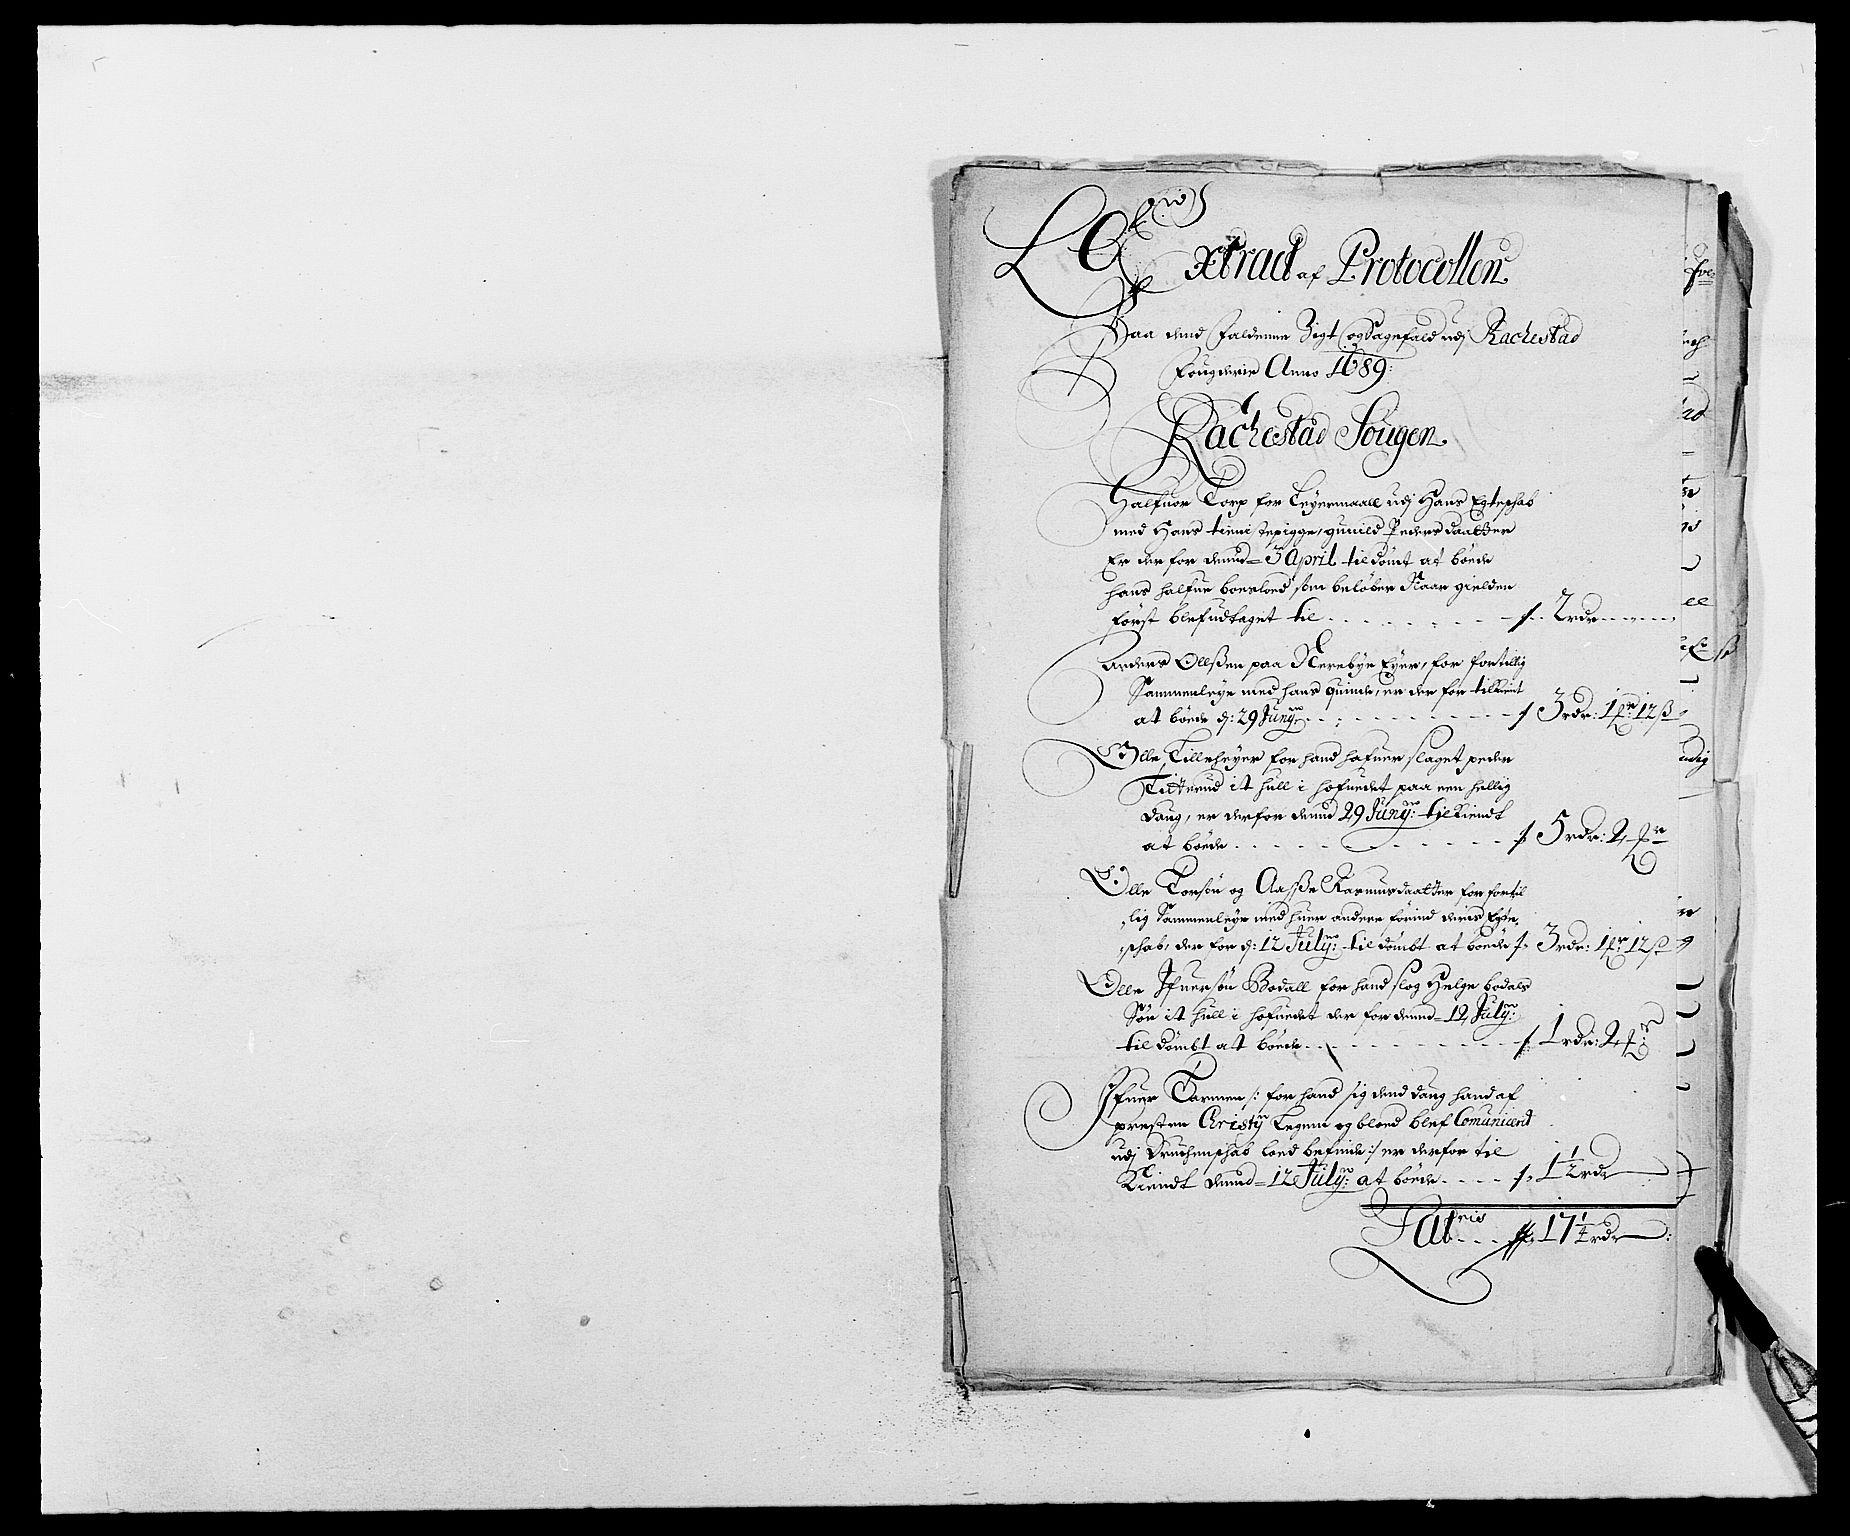 RA, Rentekammeret inntil 1814, Reviderte regnskaper, Fogderegnskap, R05/L0277: Fogderegnskap Rakkestad, 1689-1690, s. 42